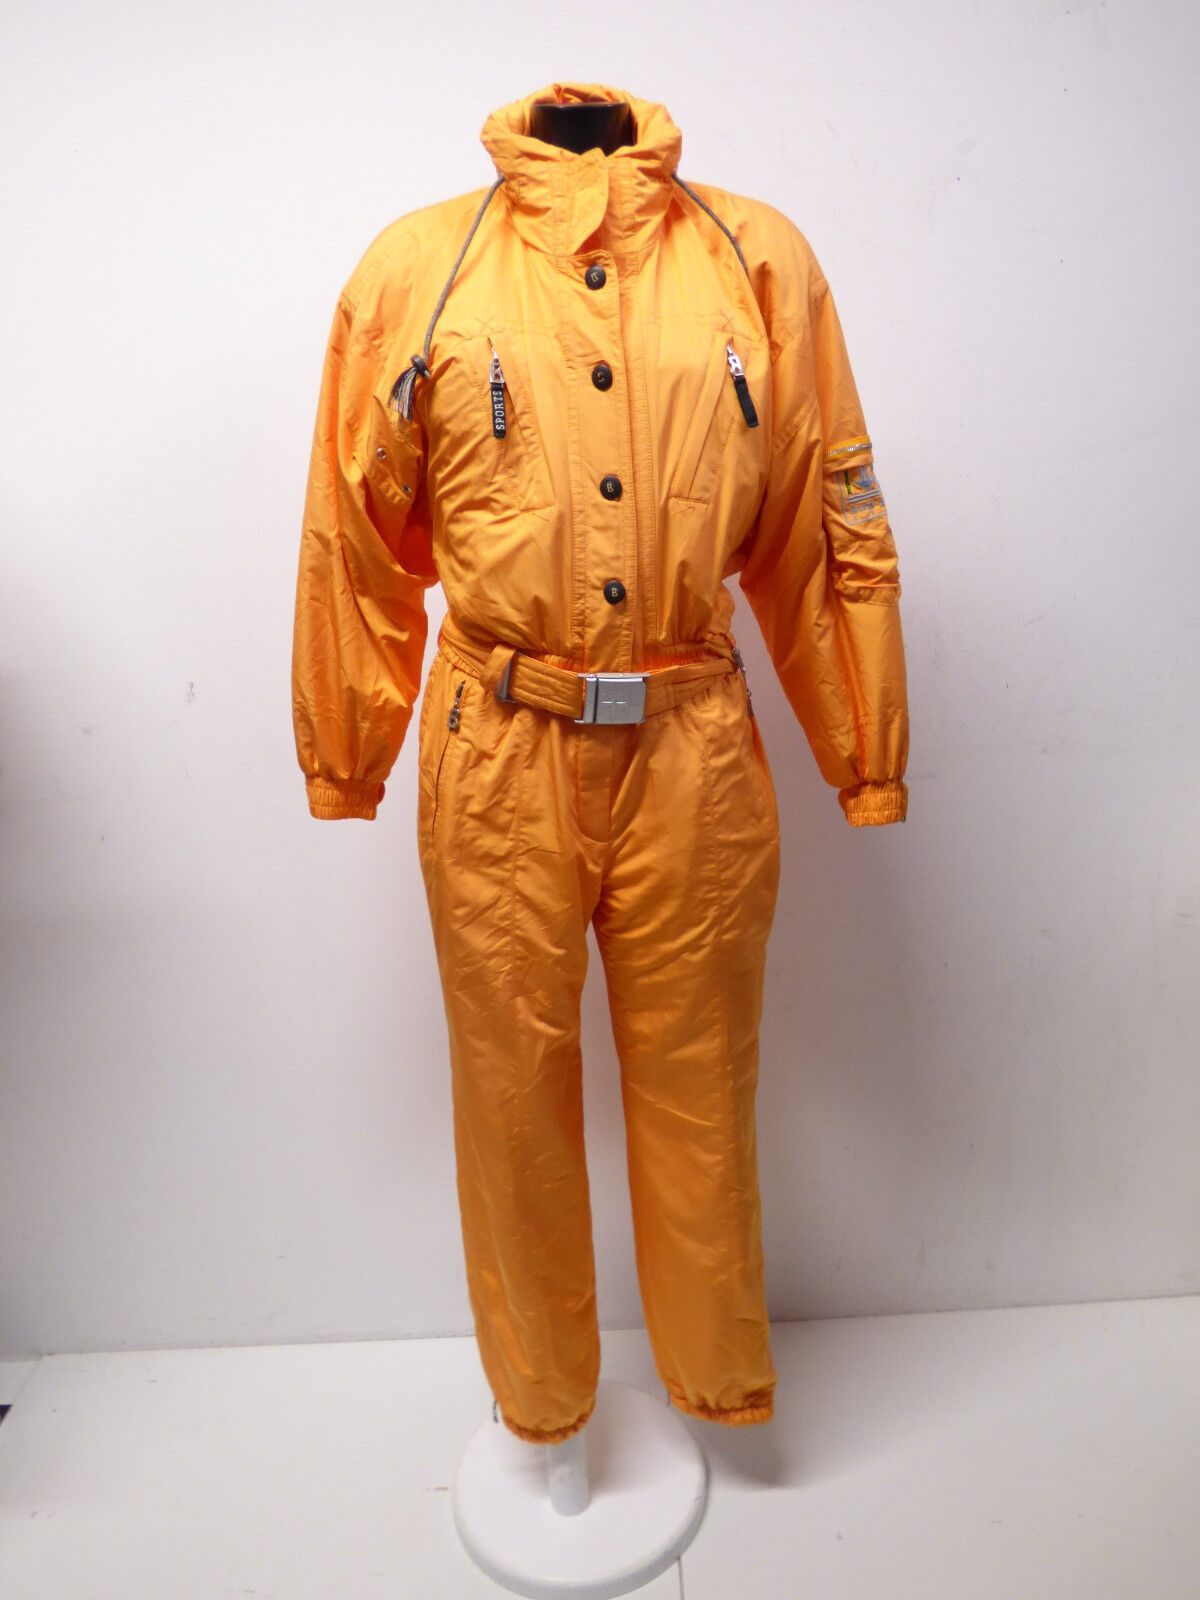 BOGNER DAMEN SKIANZUG Gr 38  - DE    IN orange & WINTERWARM  ( P 7819 R )  brand